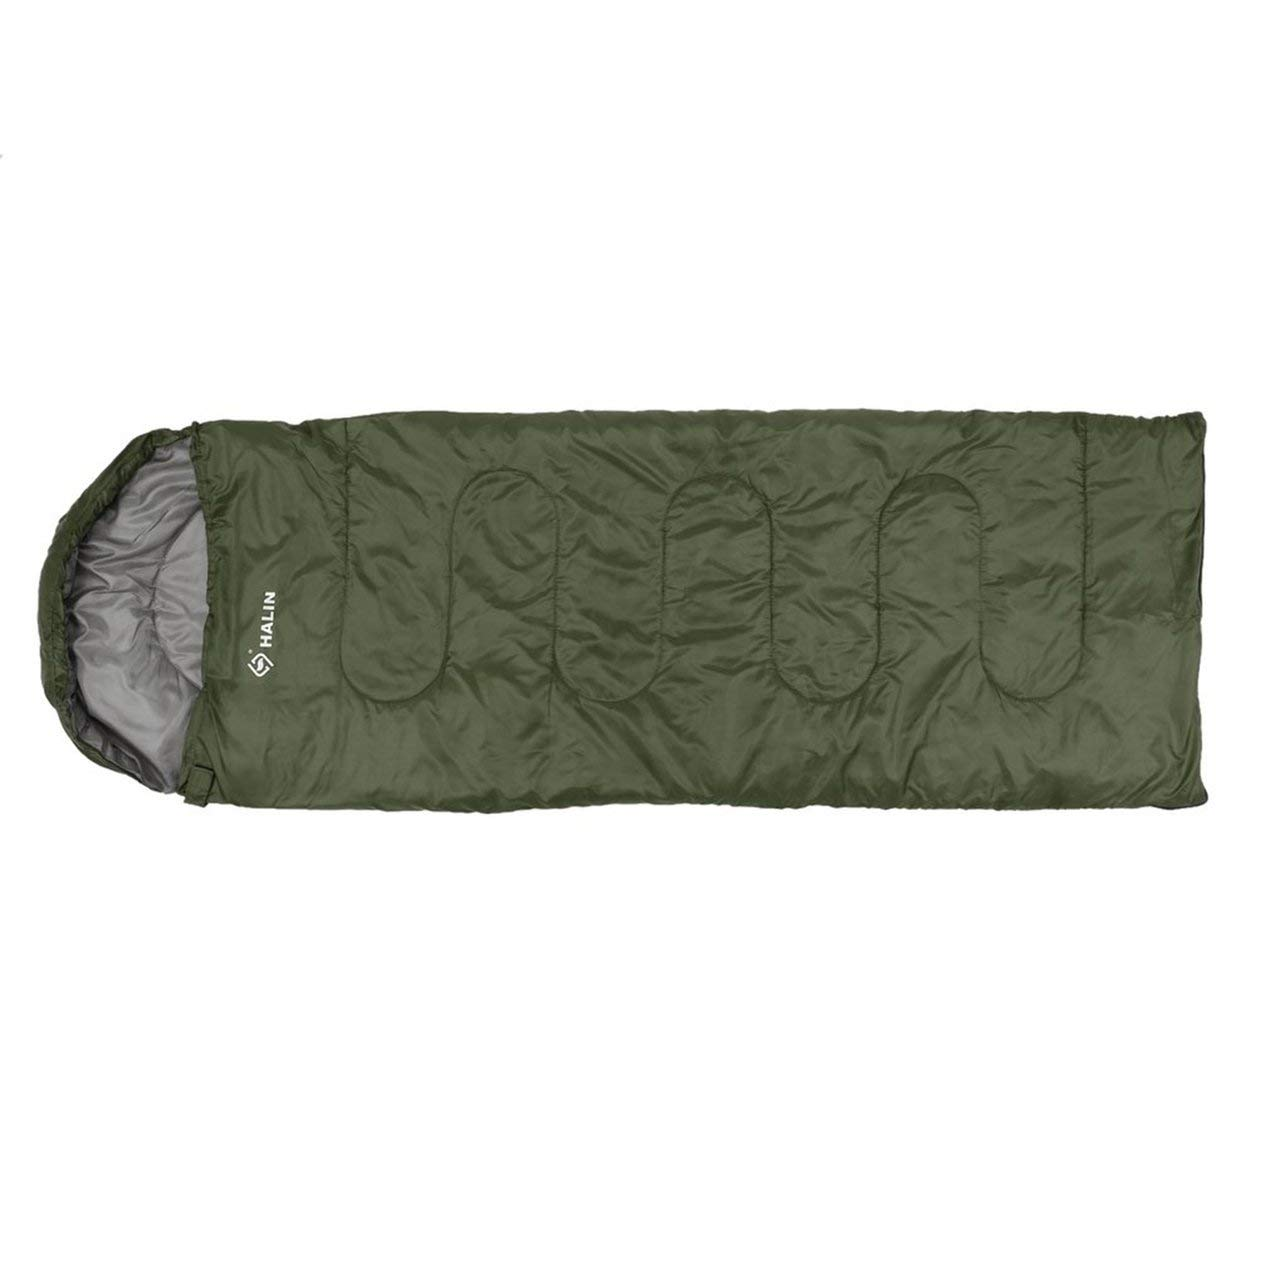 Halin Outdoor Envelope Sleeping Bag Portable Warm Cozy Camping Hiking Hooded Sleeping Bag with Storage Bag HS205